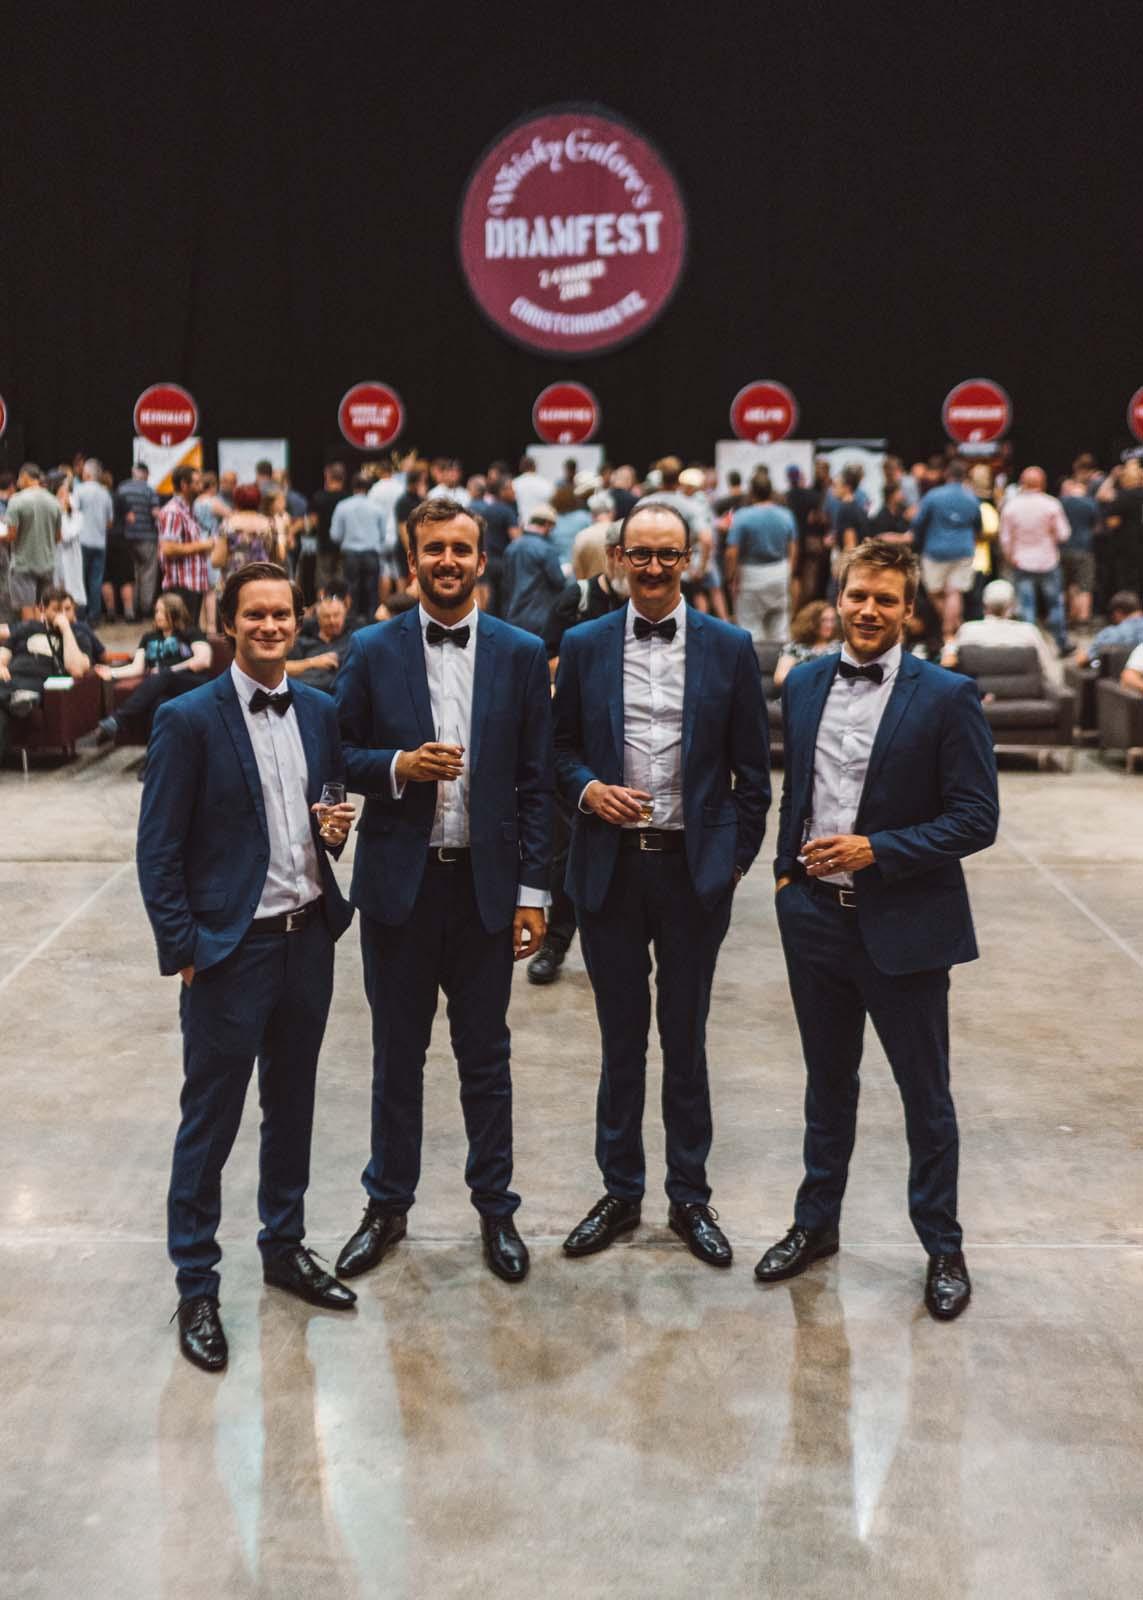 Dramfest 2018 for Whisky Galore-24.jpg